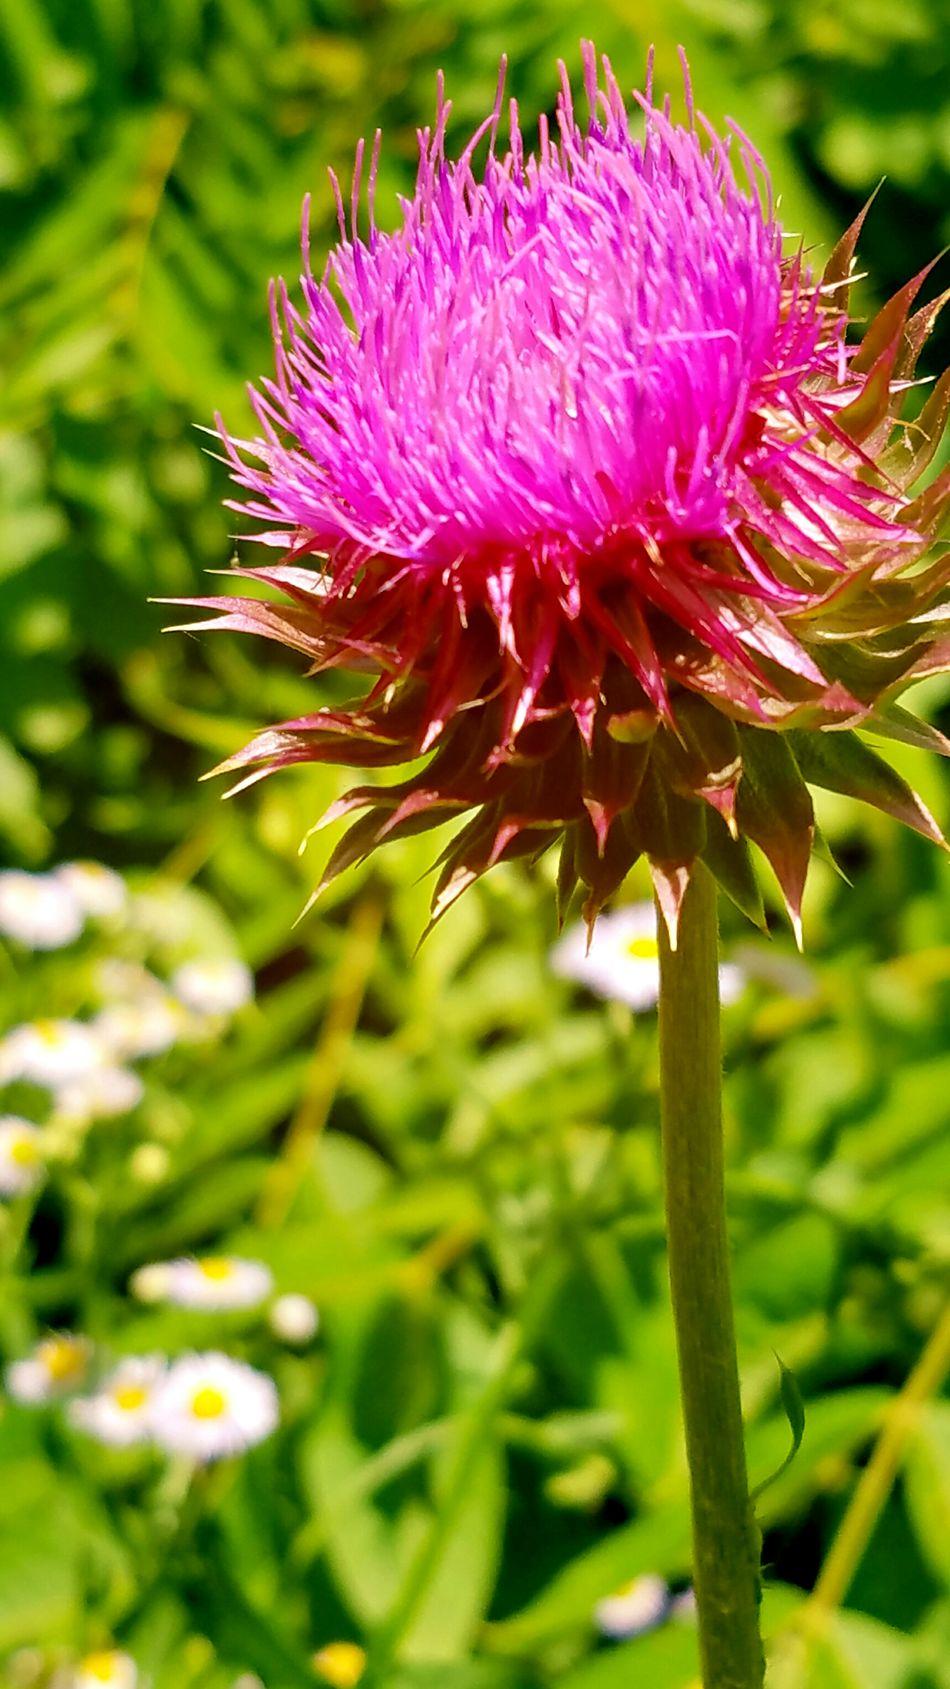 EyeEm Best Shots EyeEm Nature Lover Outdoor Photography Beauty In Nature Flowerporn Flowers EyeEm Flower Purple Nettle